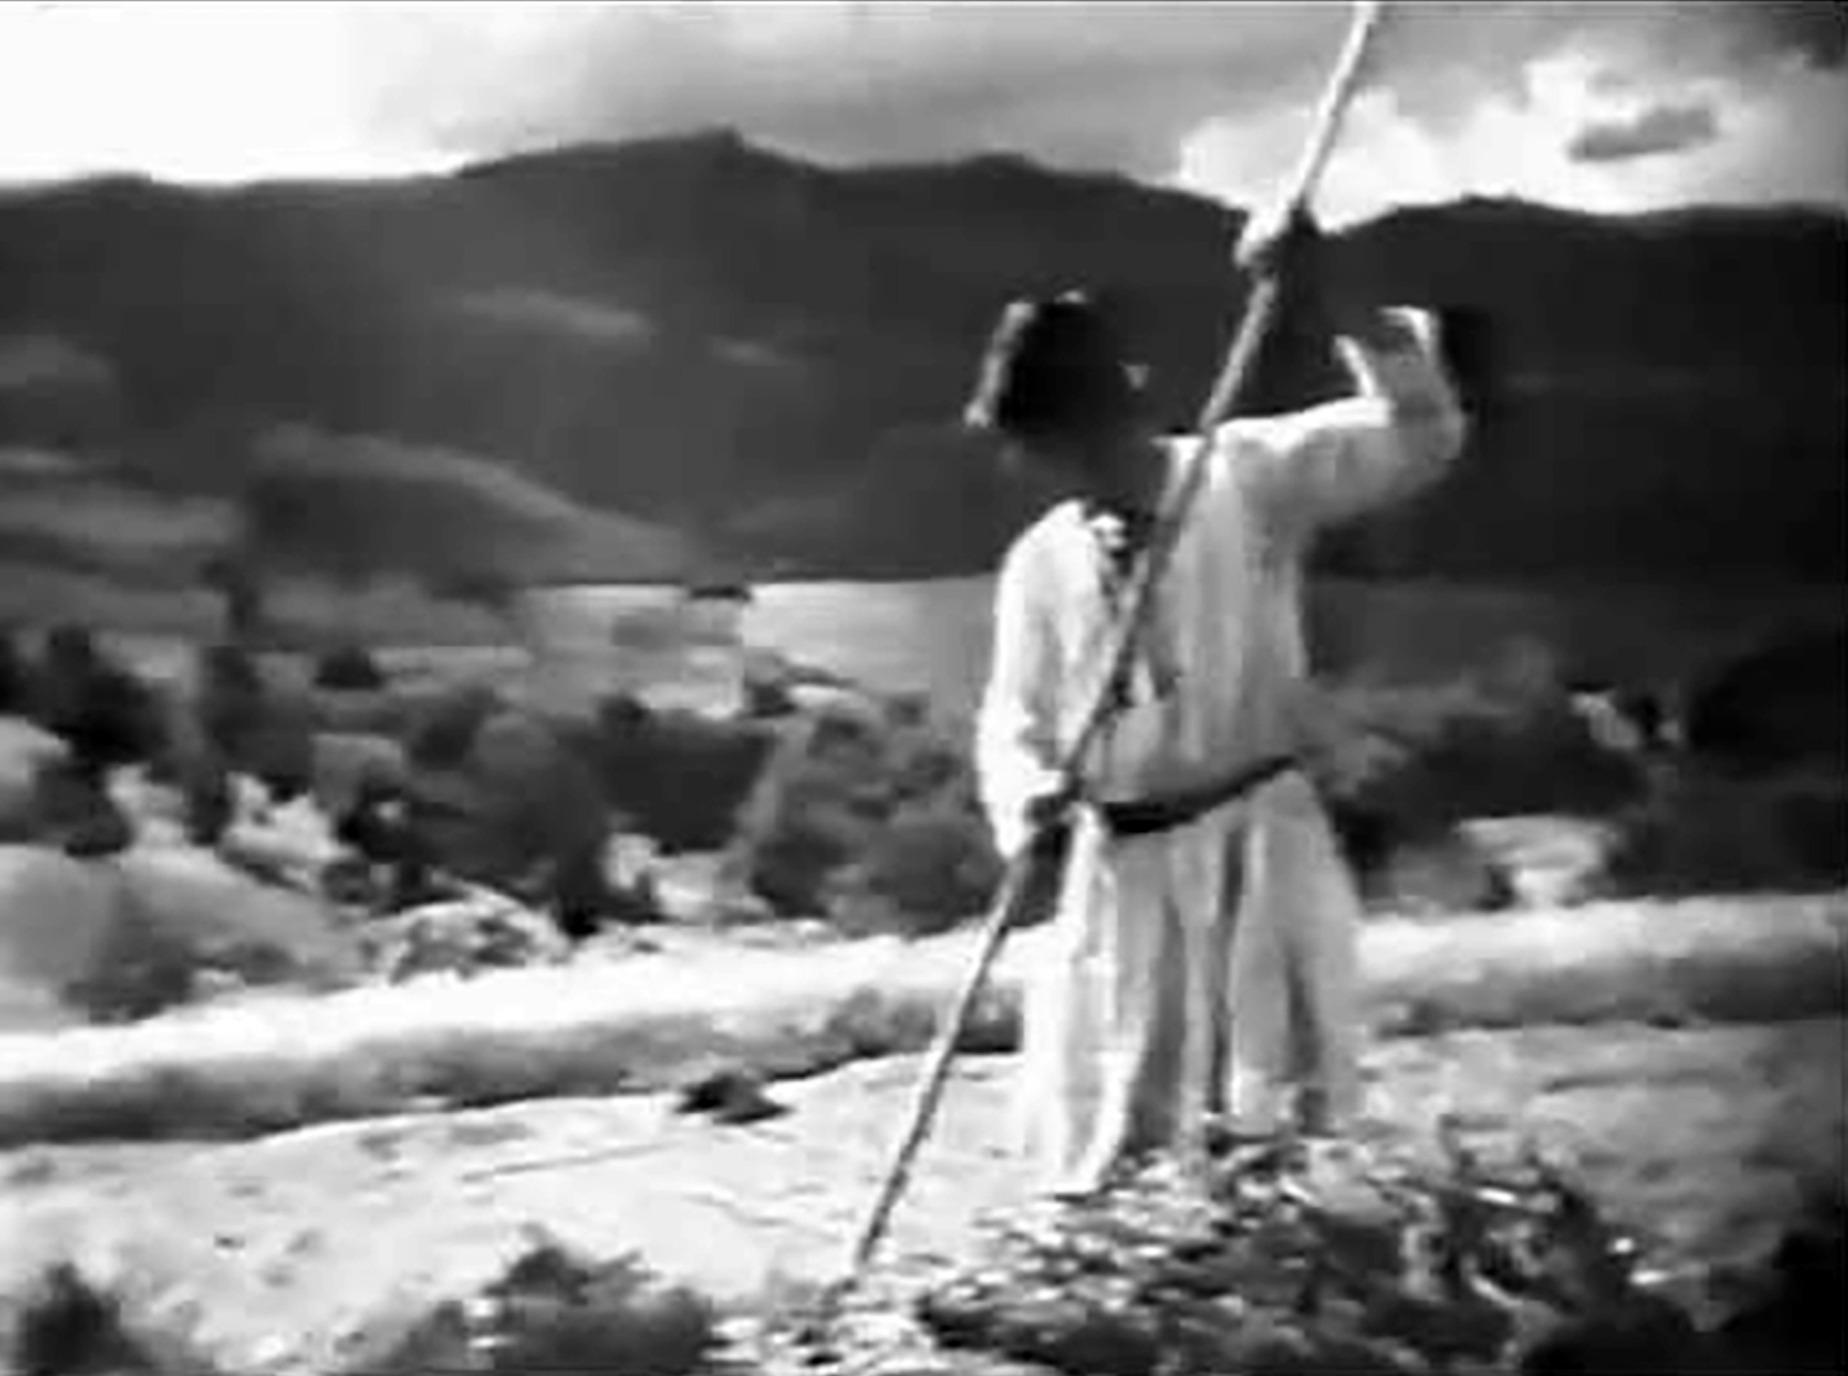 «Буковина — земля украинская». 1940. Реж. Юлия Солнцева, Александр Довженко